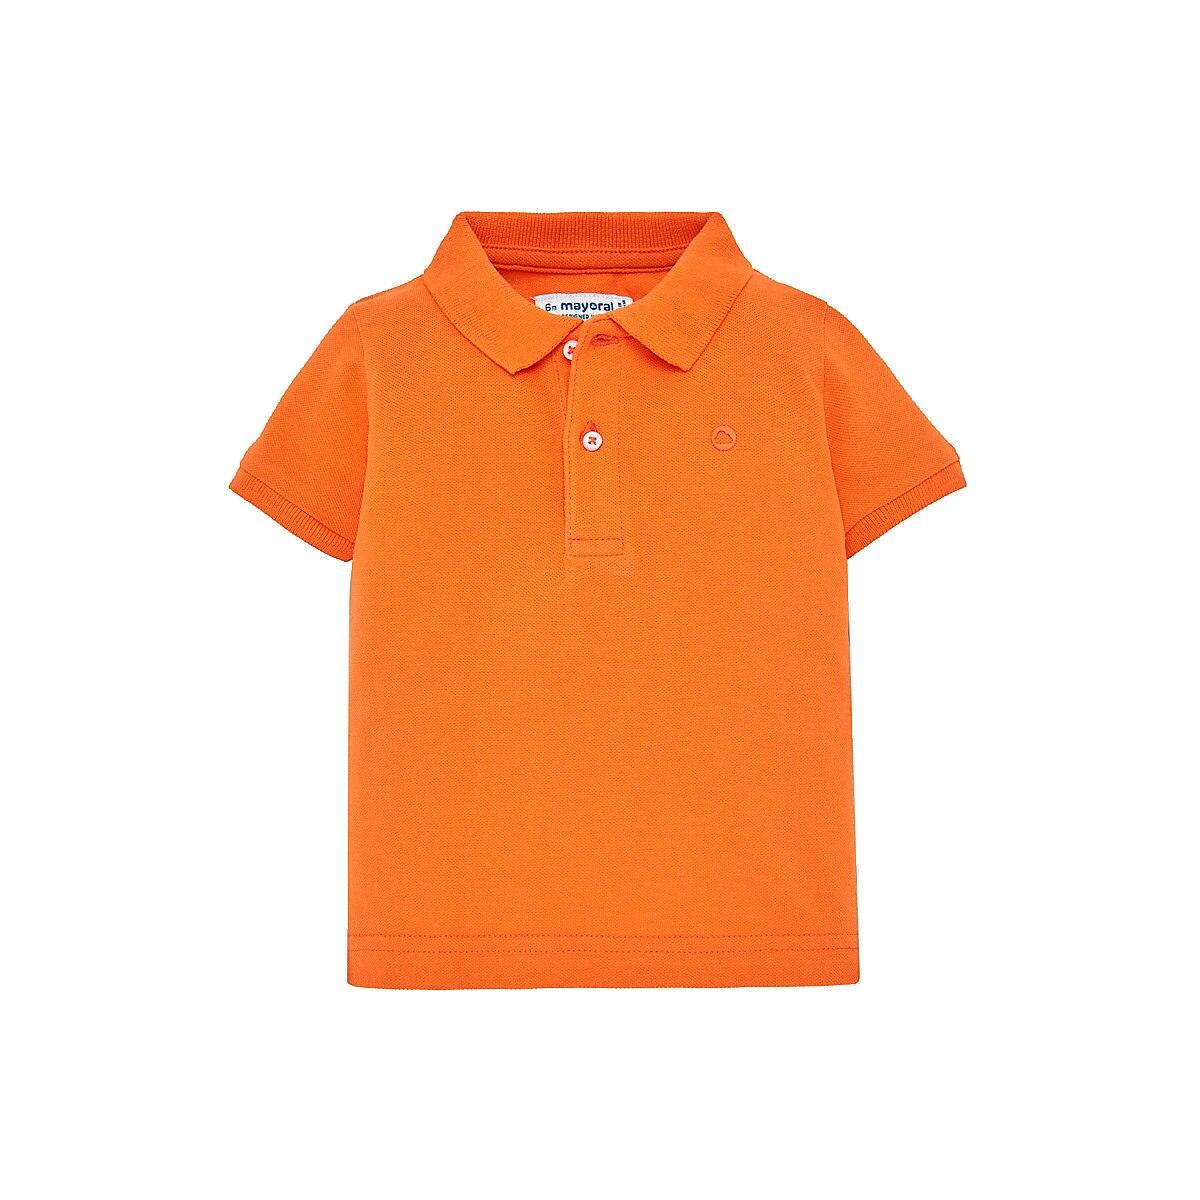 MAYORAL Polo Shirts 10685555 children clothing t-shirt shirt the print for boys